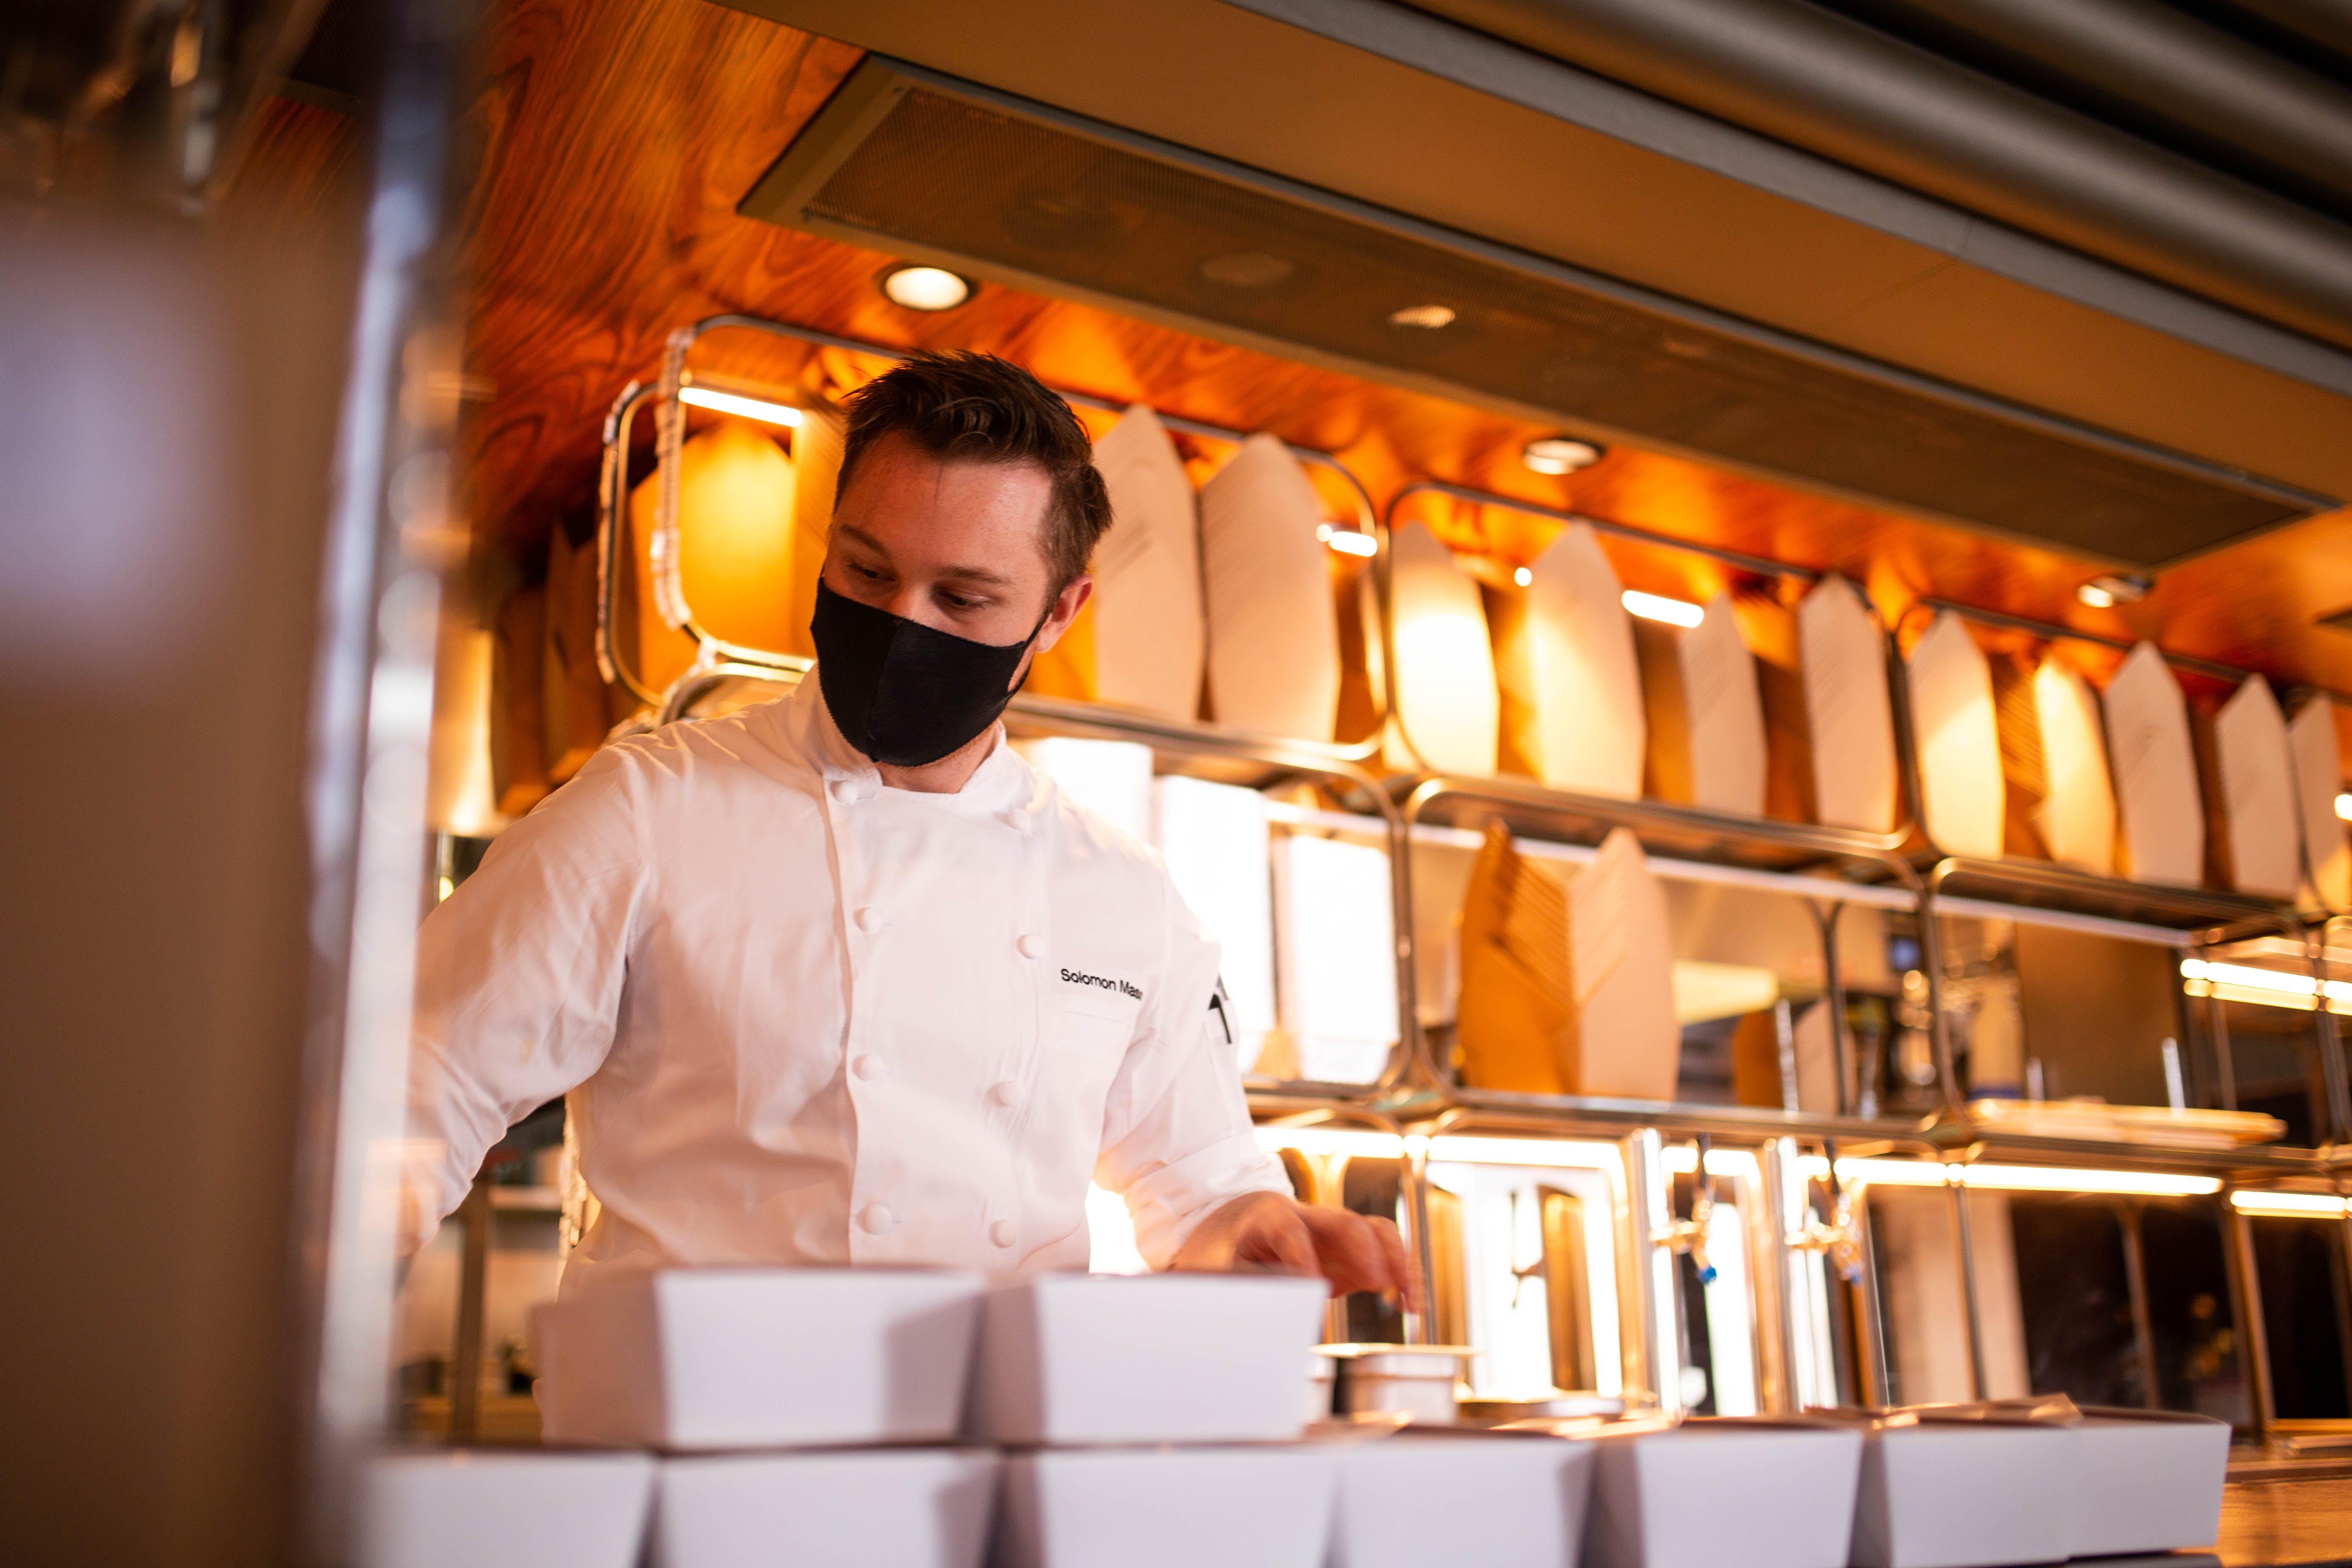 Solomon Mason prepares takeout meals at Aloette in Toronto.